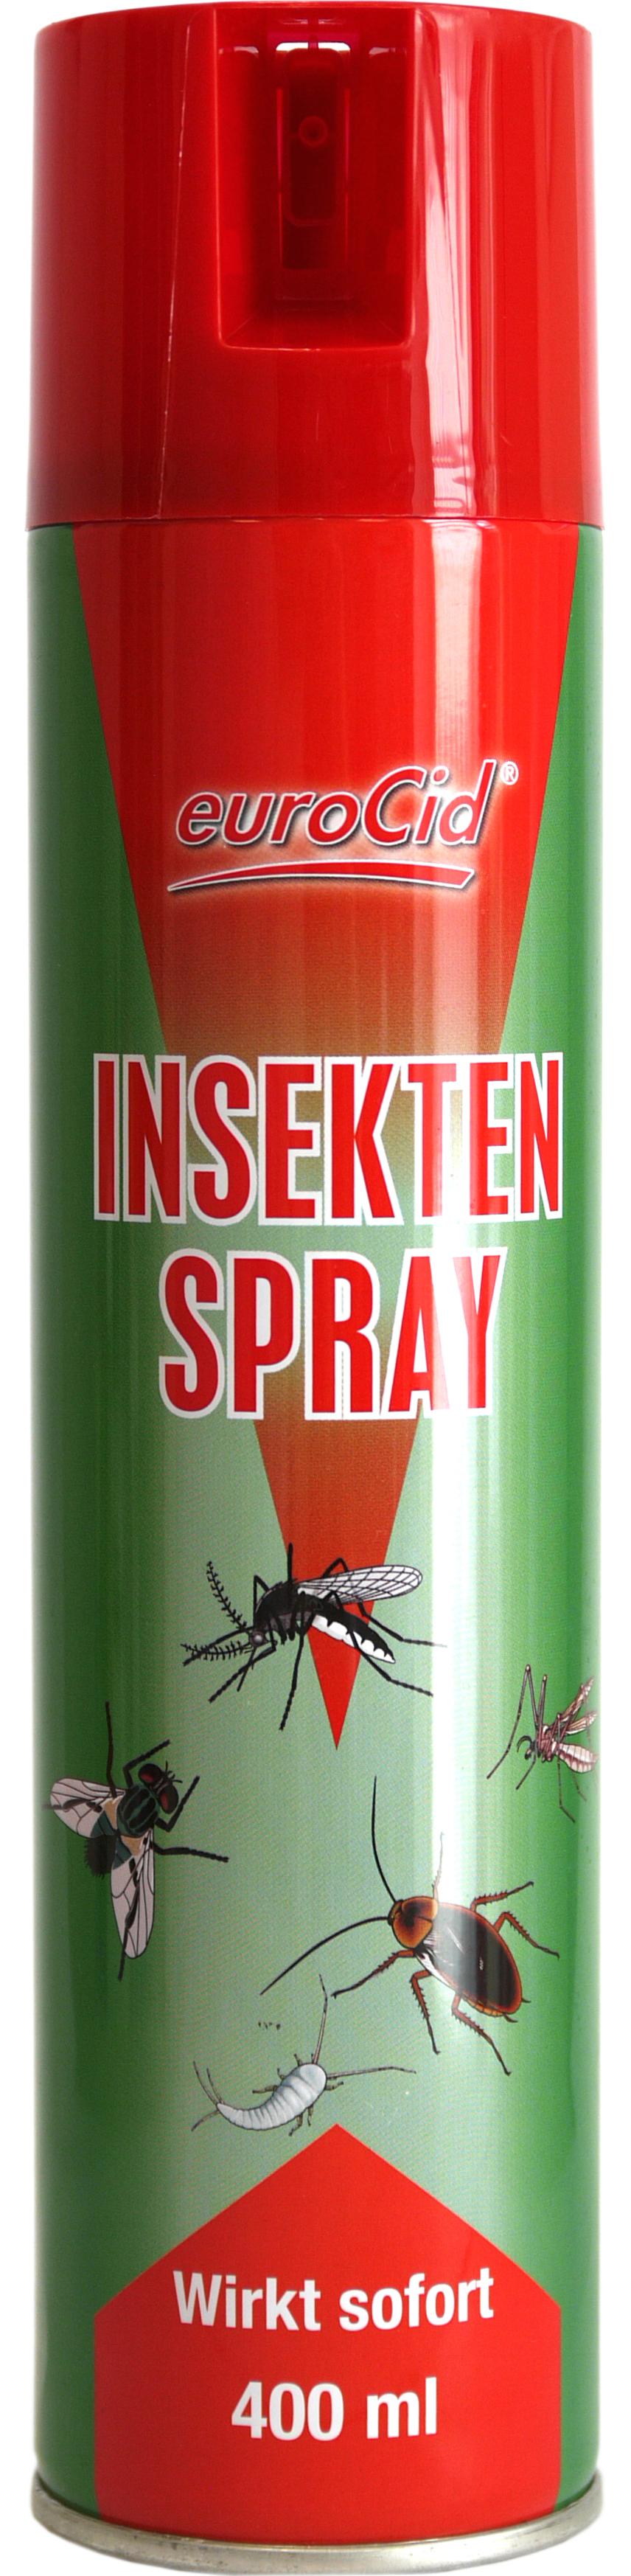 02000 - euroCid Insektenspray 400ml BIOZID